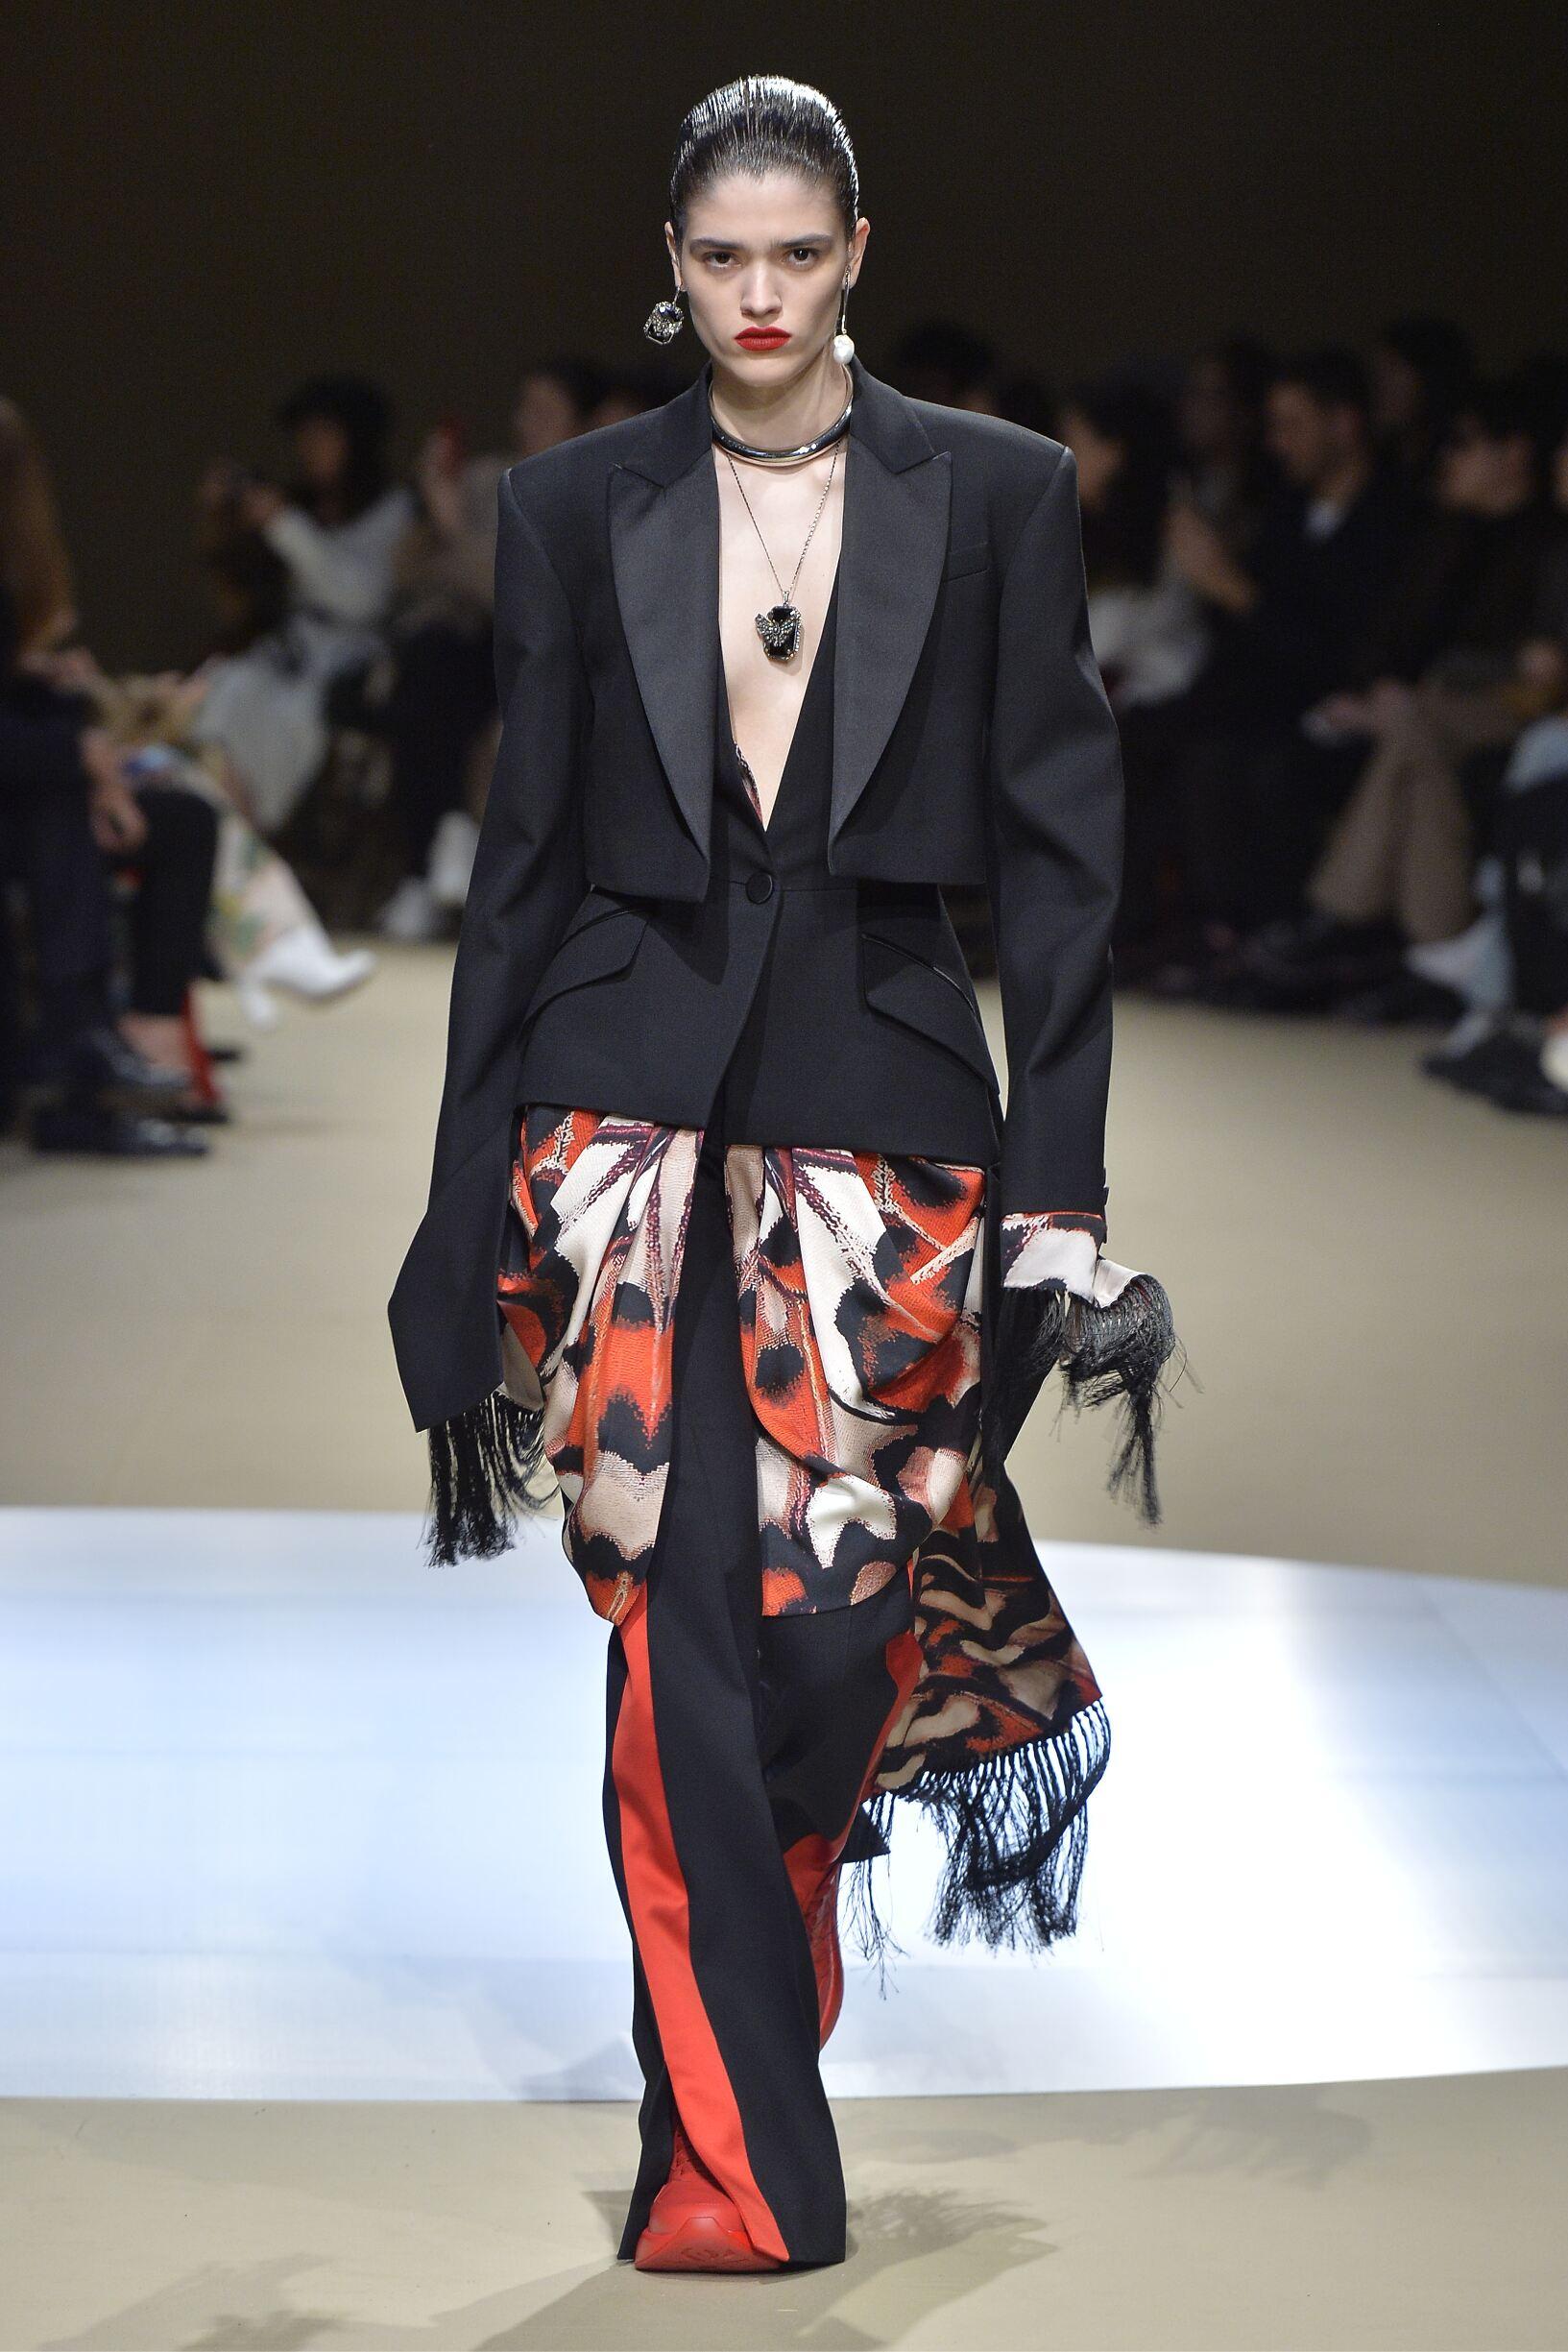 Alexander McQueen Woman Style 2018